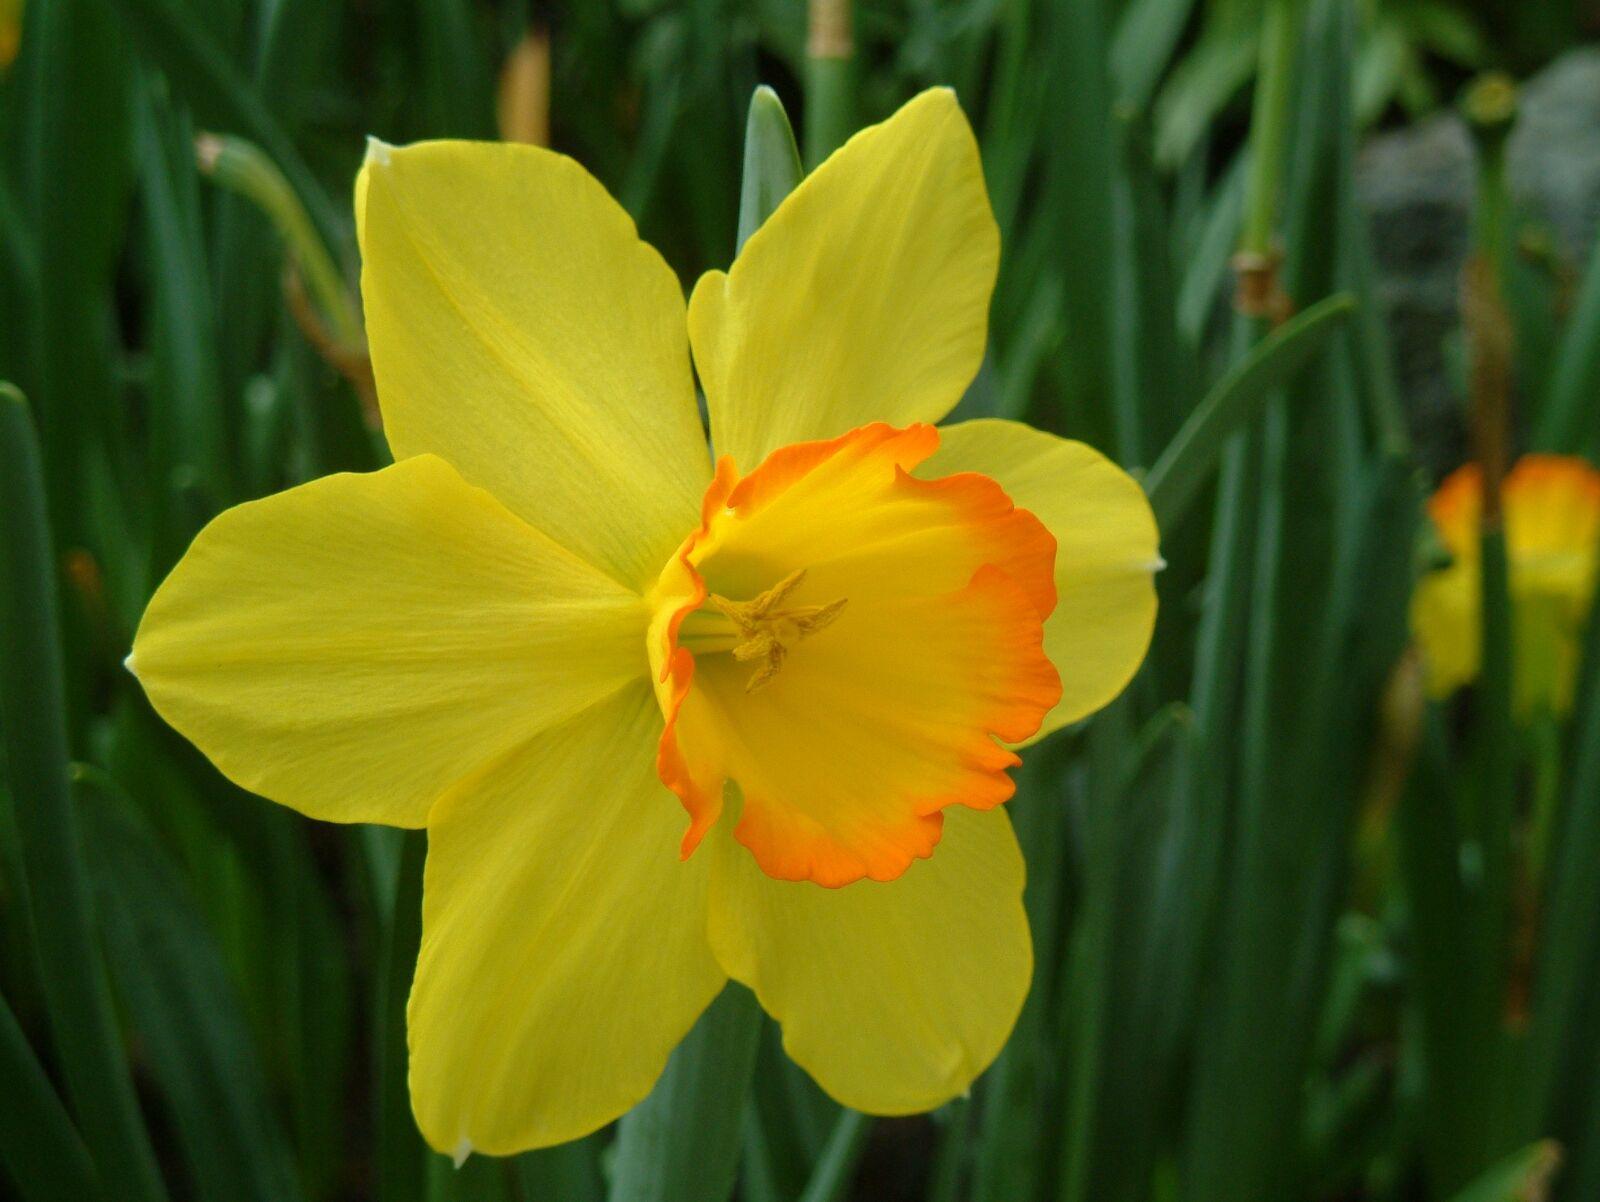 plant, yellow flower, western